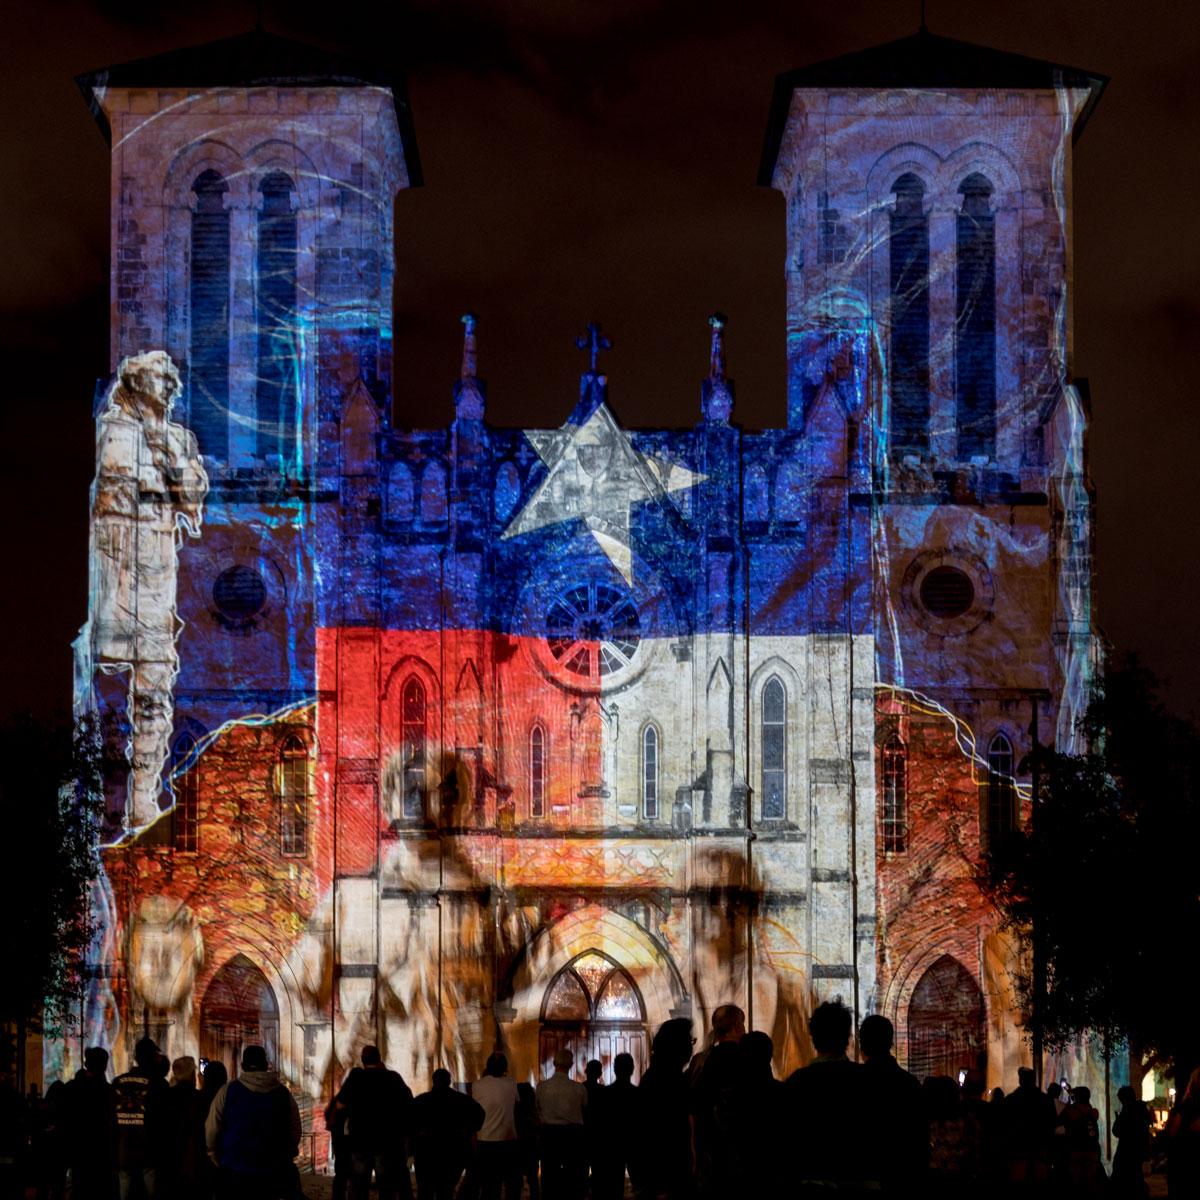 The lightshow on the facade of San fernando church in San Antonio.